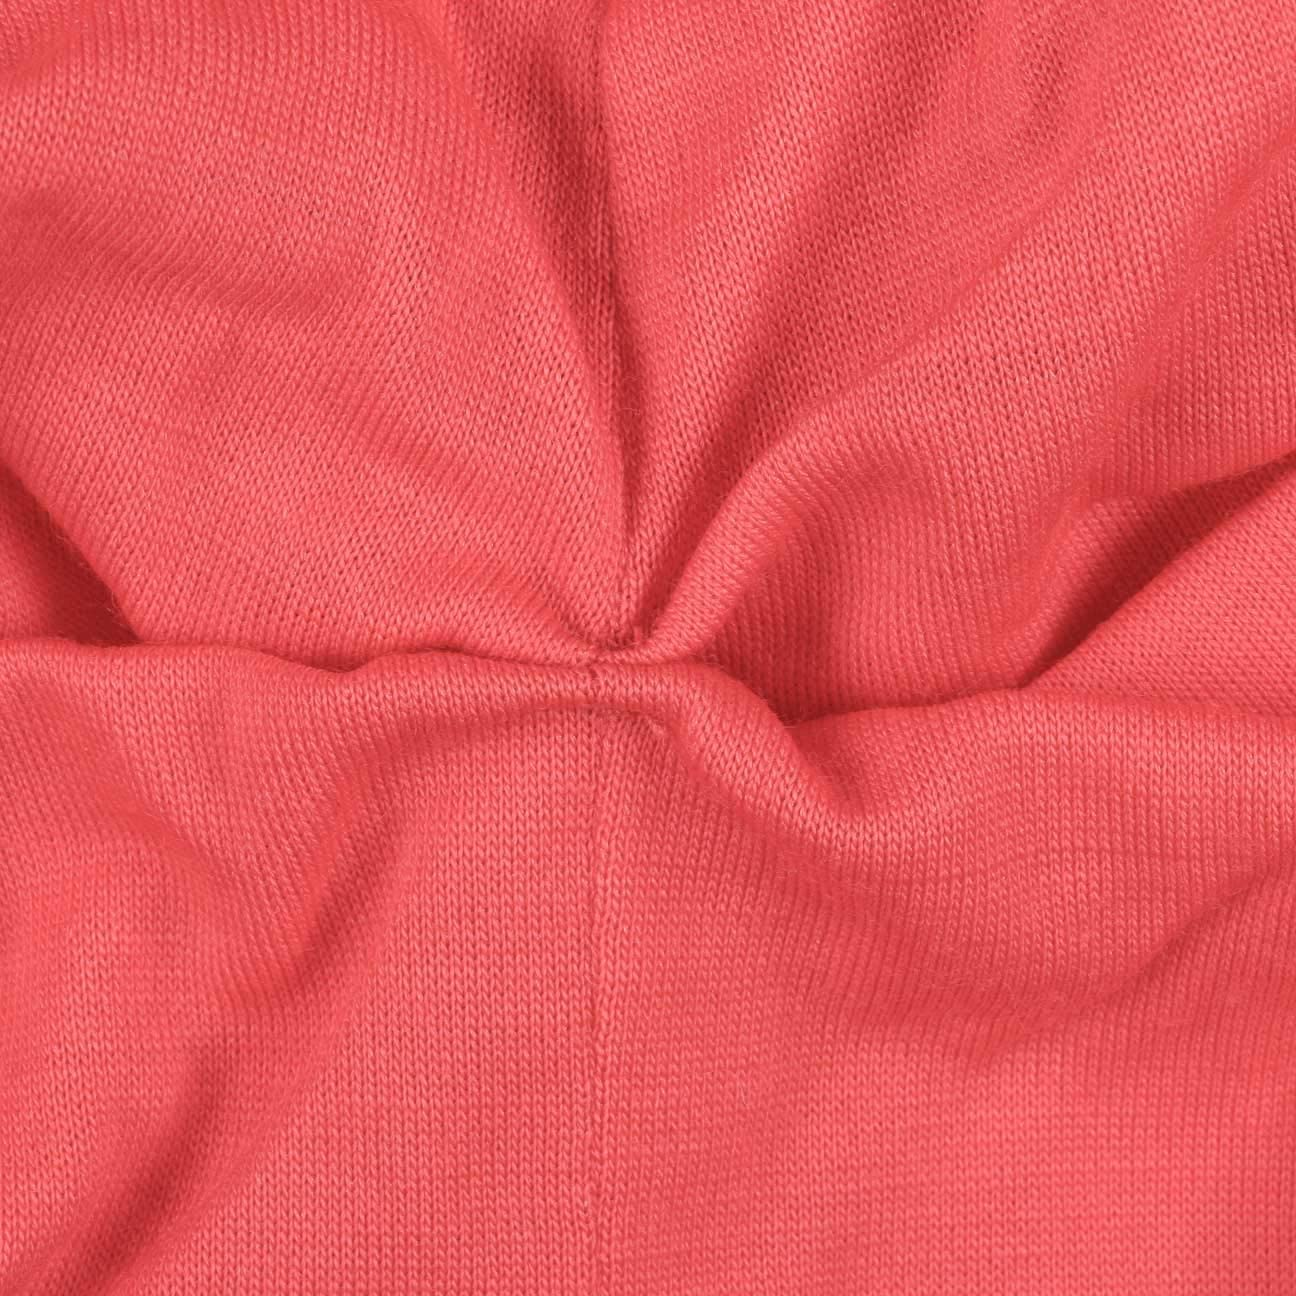 Christine Headwear Becca-Uni 37,5 Grad Turban Kopftuch Chemo-Kopfbedeckung